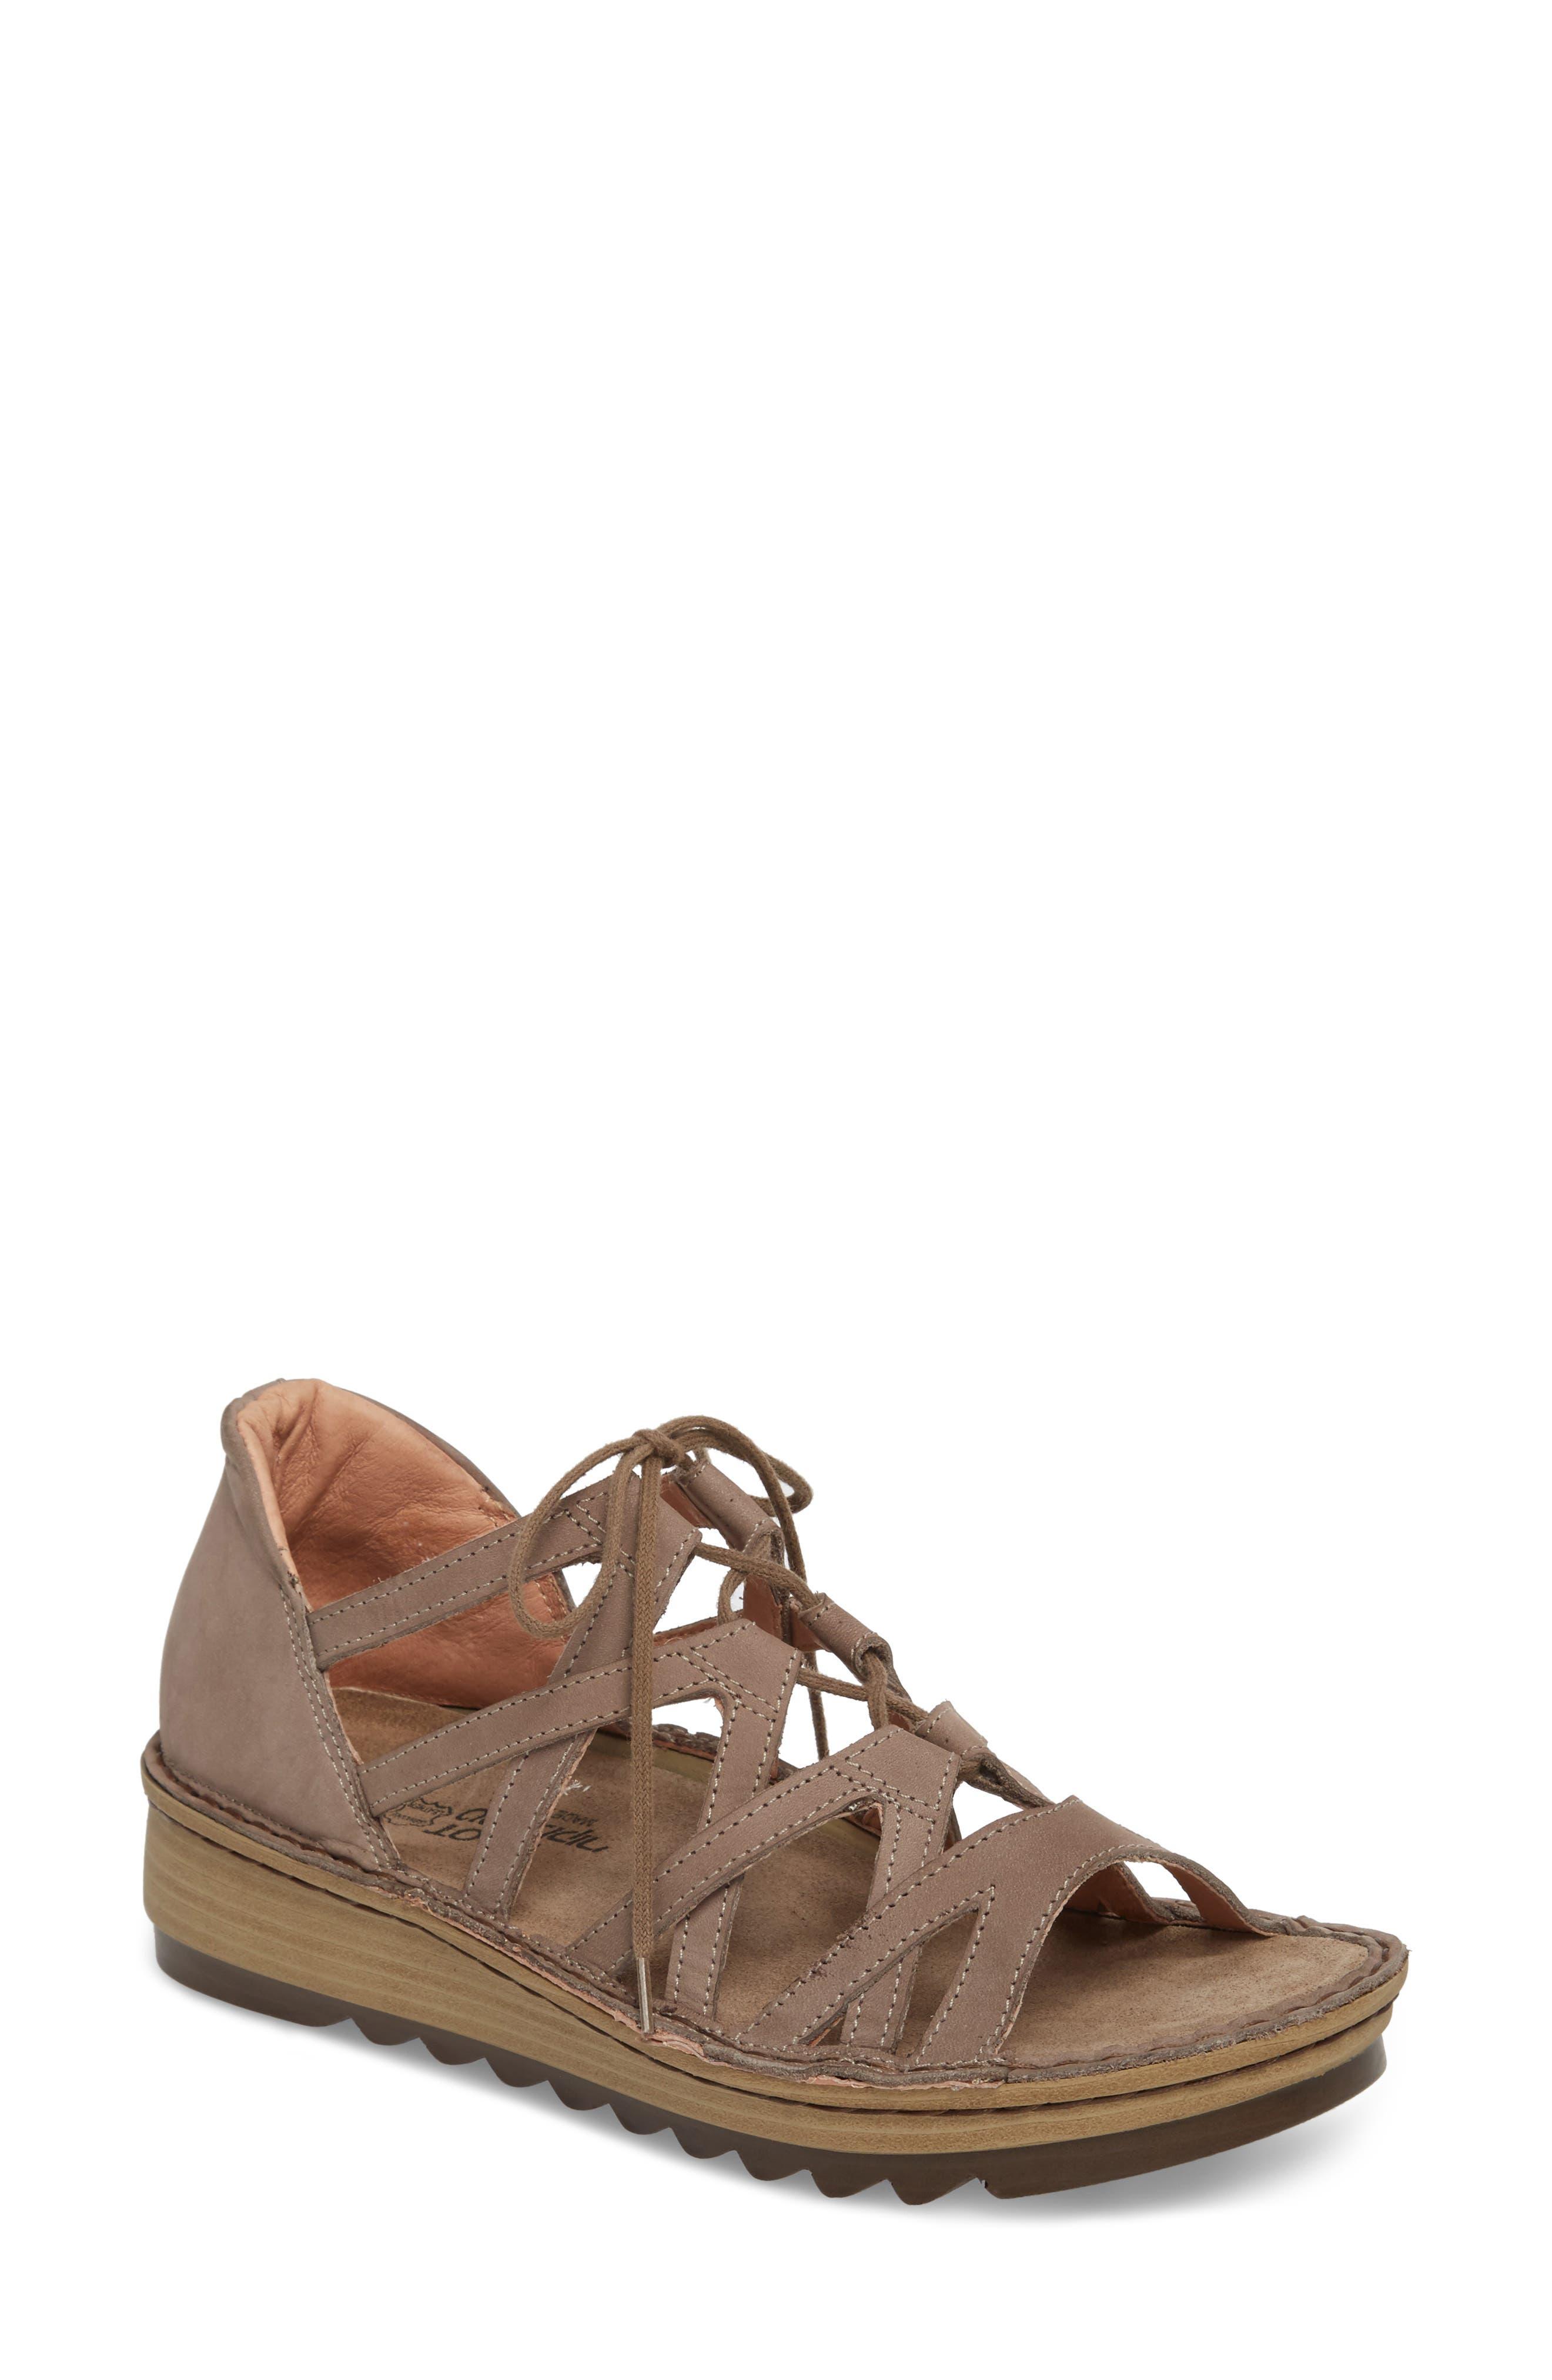 NAOT Yarrow Sandal, Main, color, STONE NUBUCK